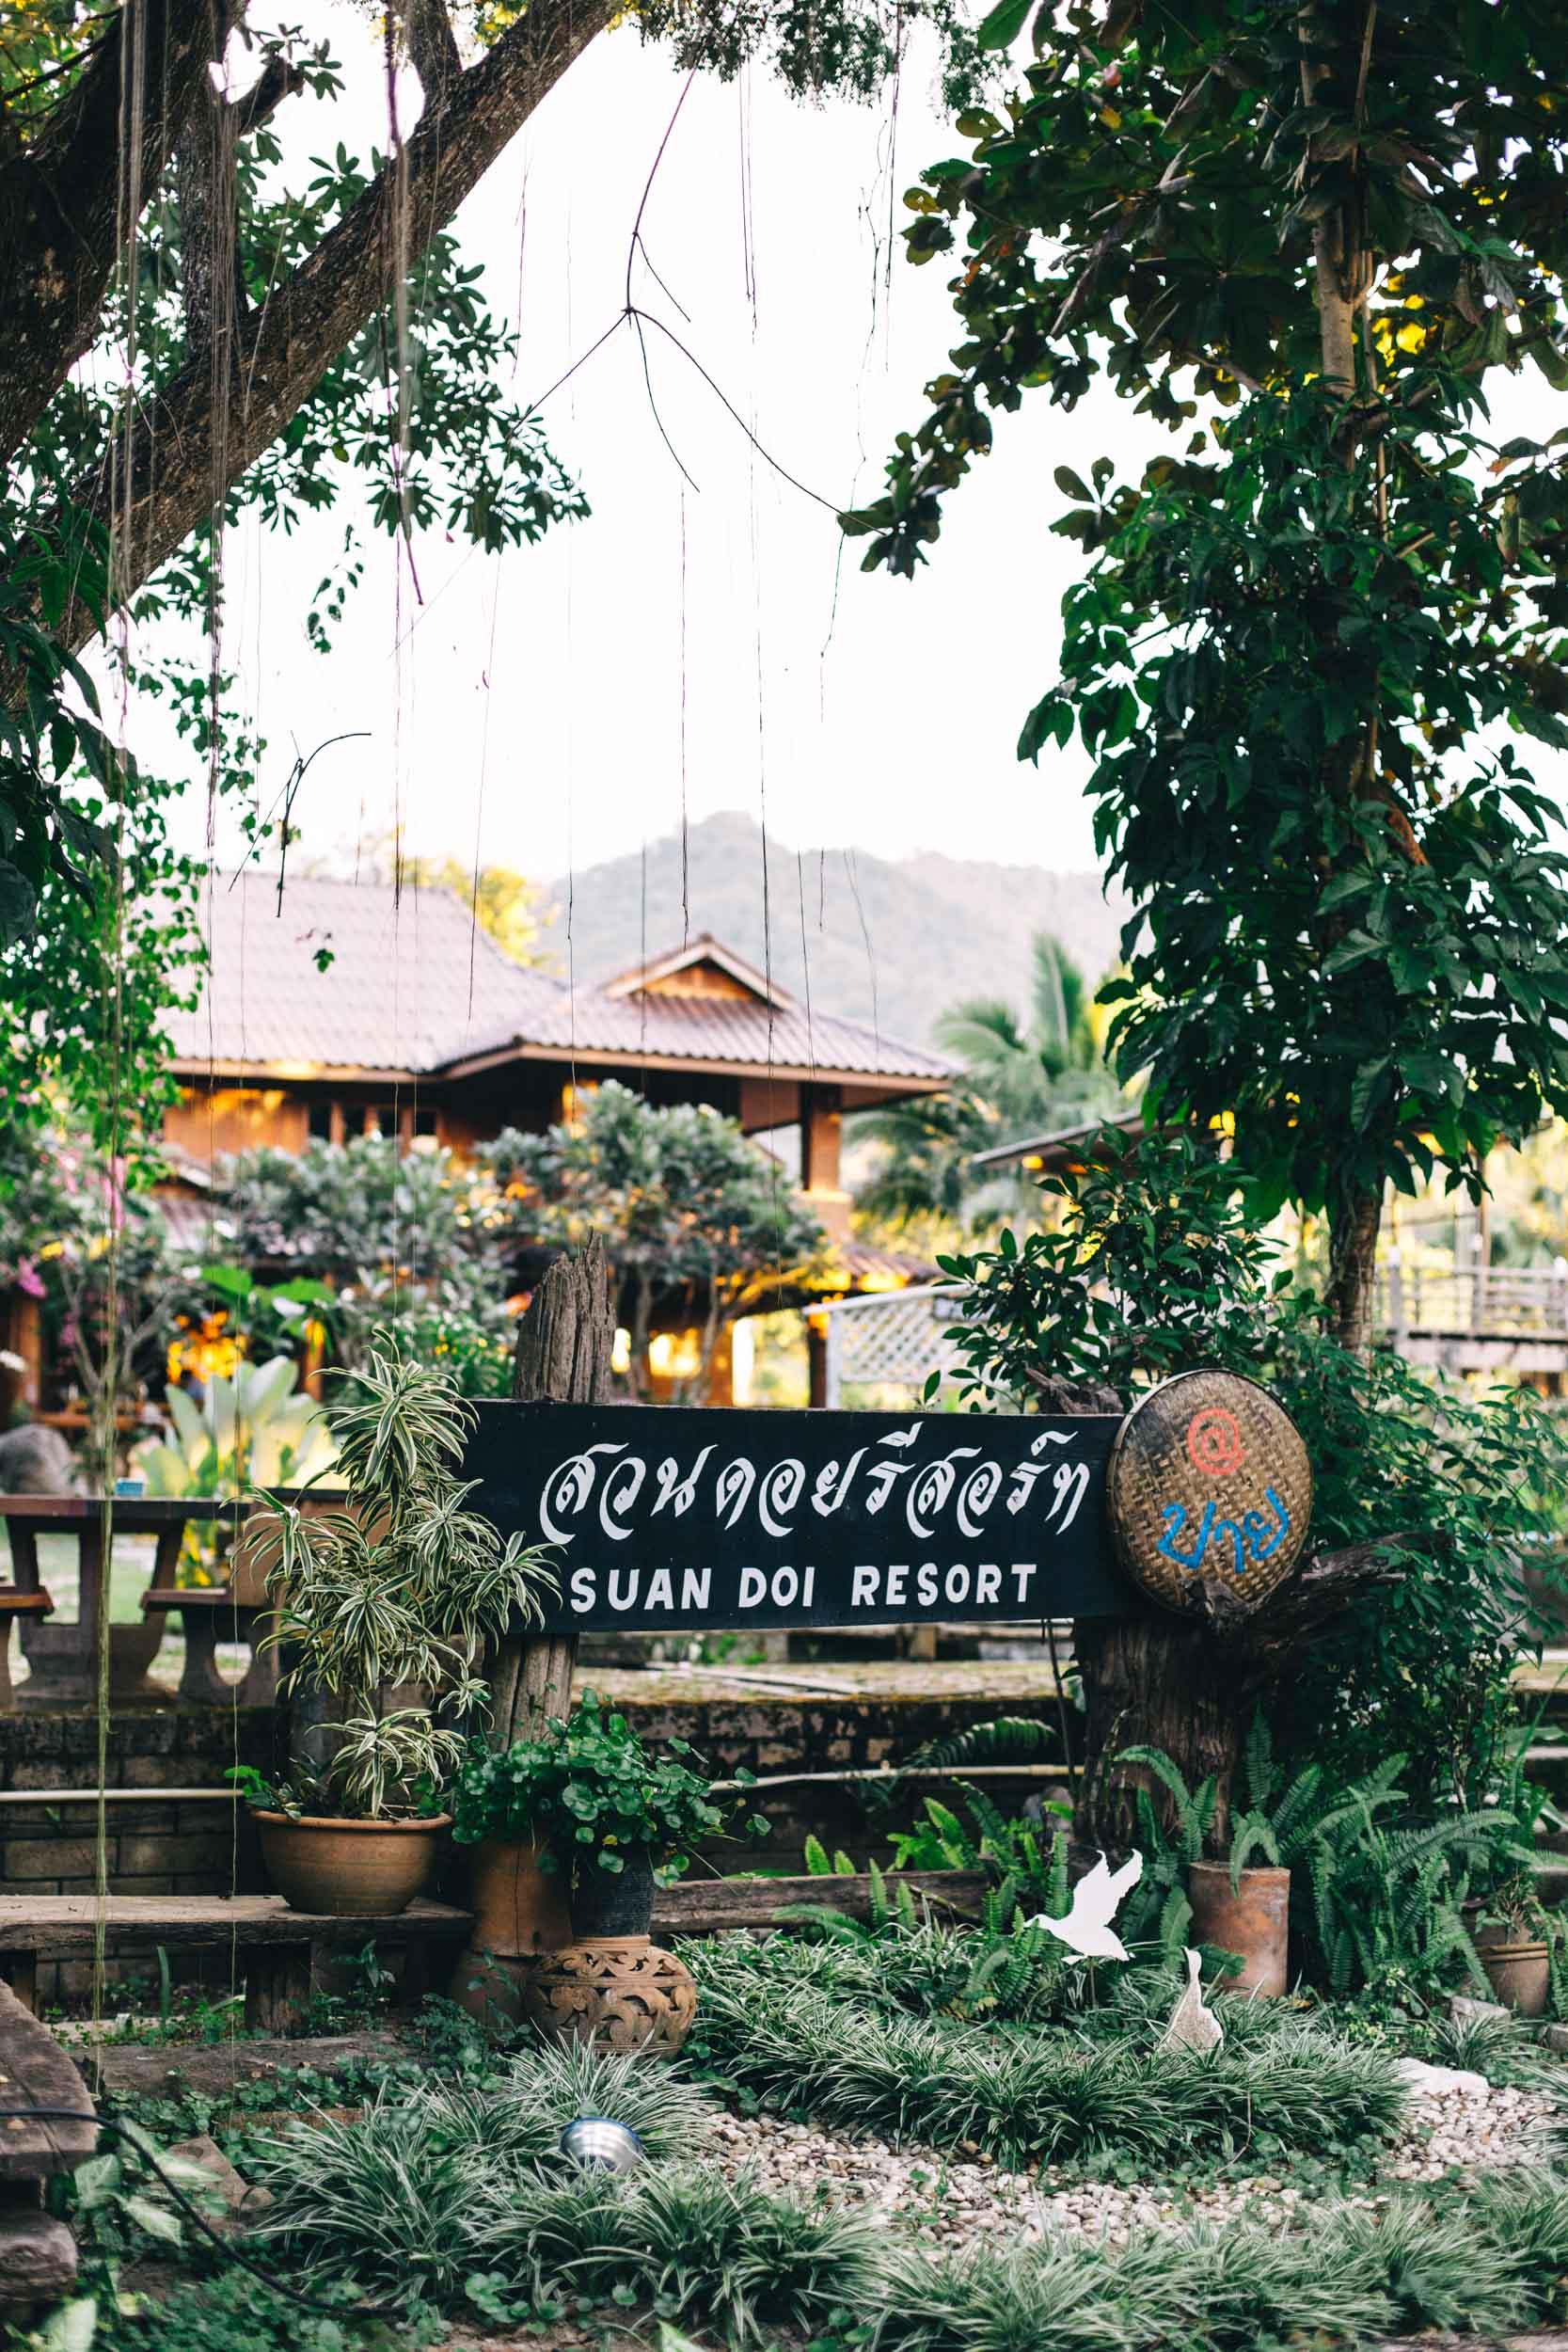 thailand_budget_travel_045.jpg